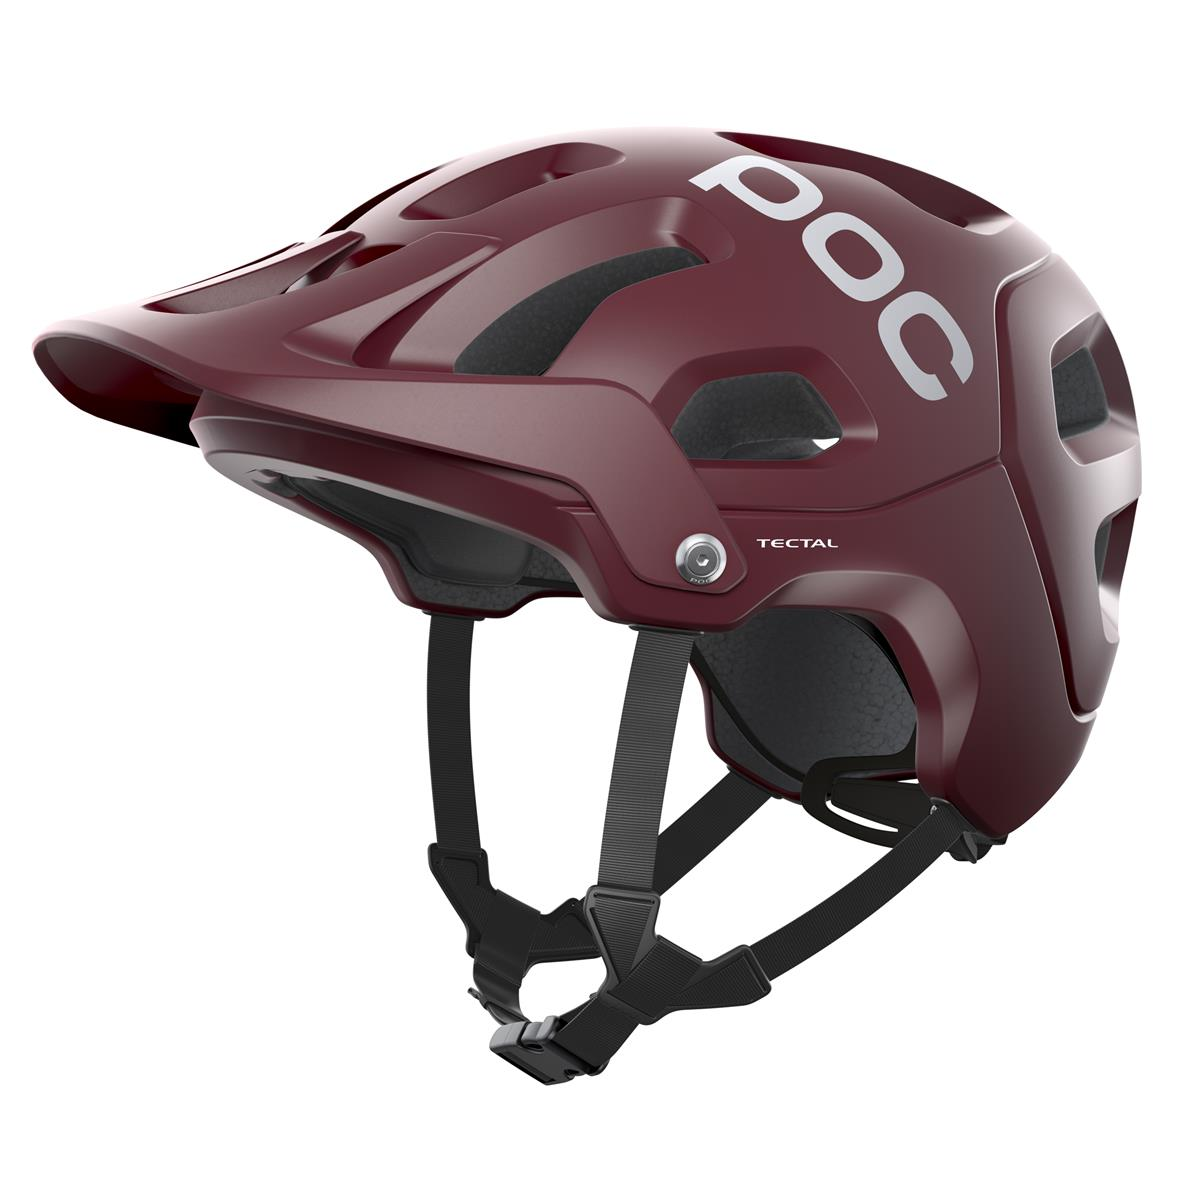 Enduro Helmet Tectal Propylene Red Matt size XS-S (51-54)